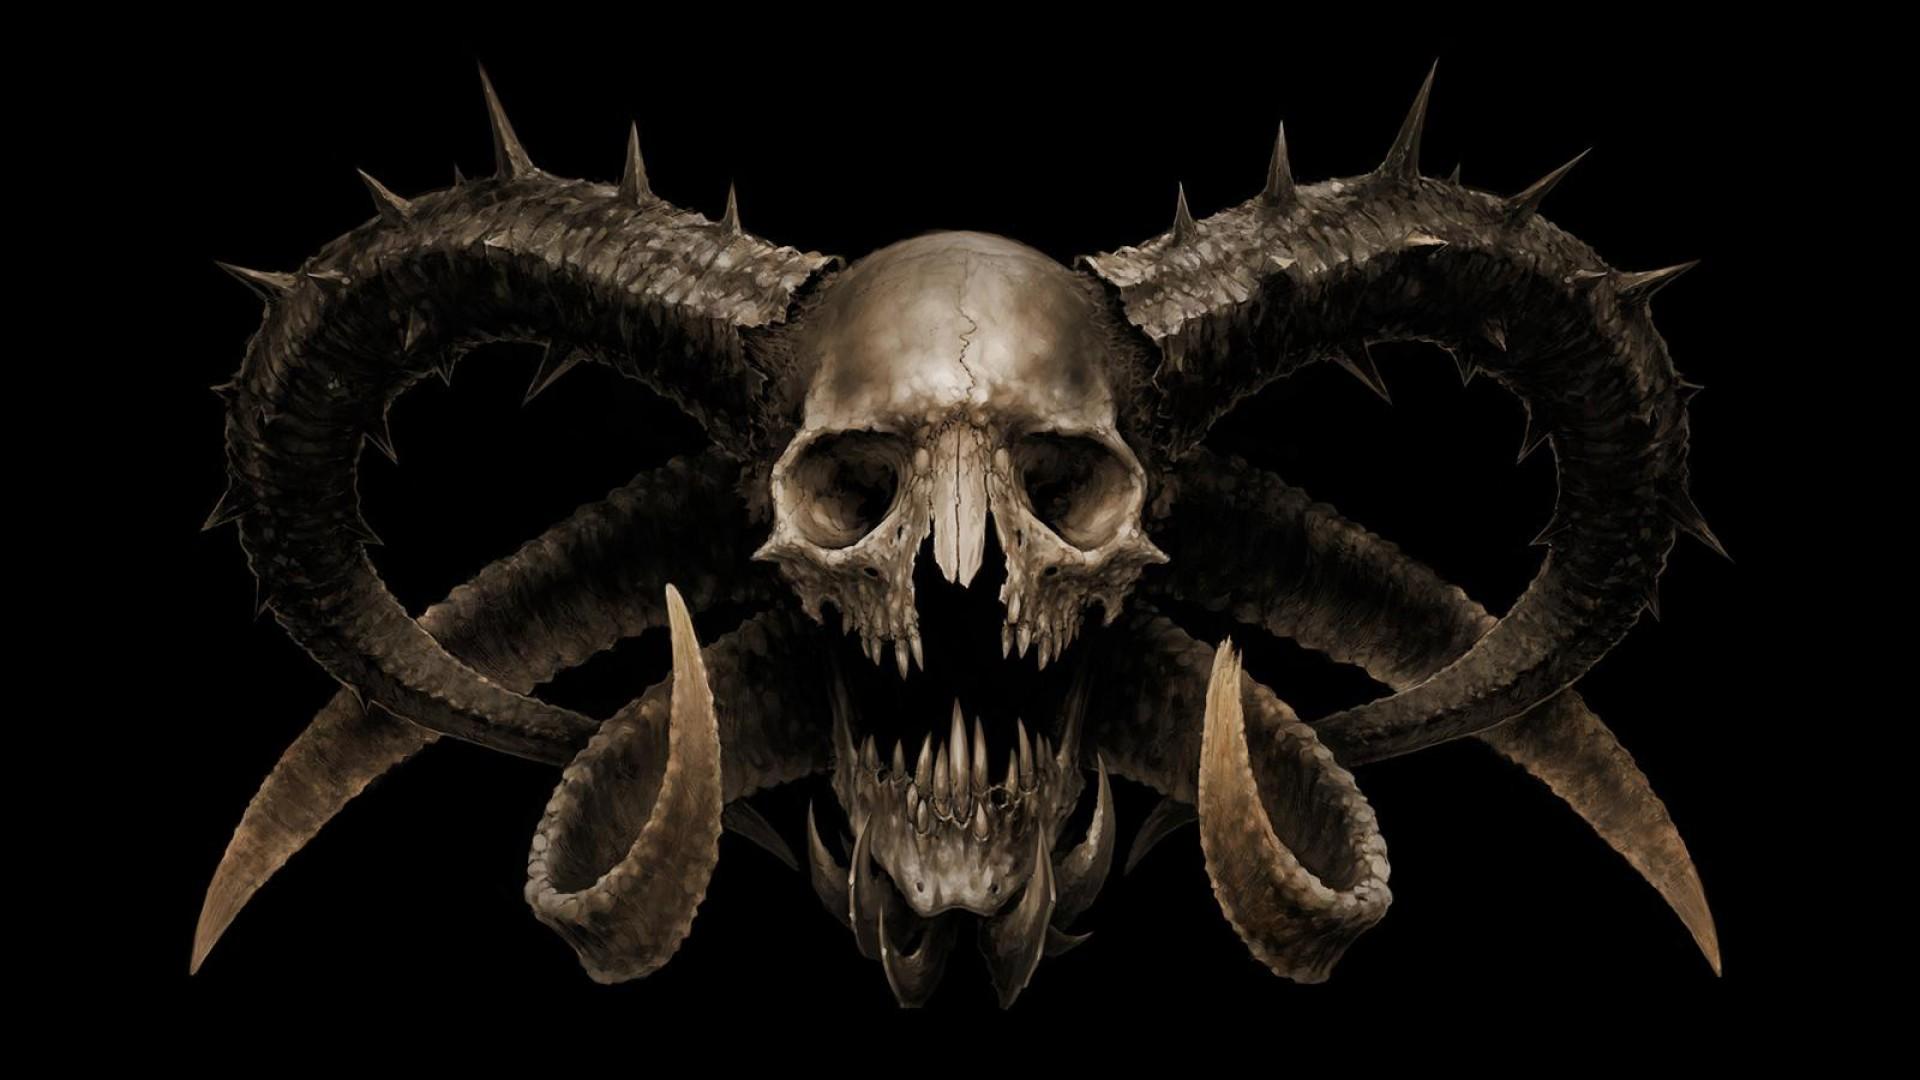 Free Download Skull Wallpapers Stunning Hd Desktop